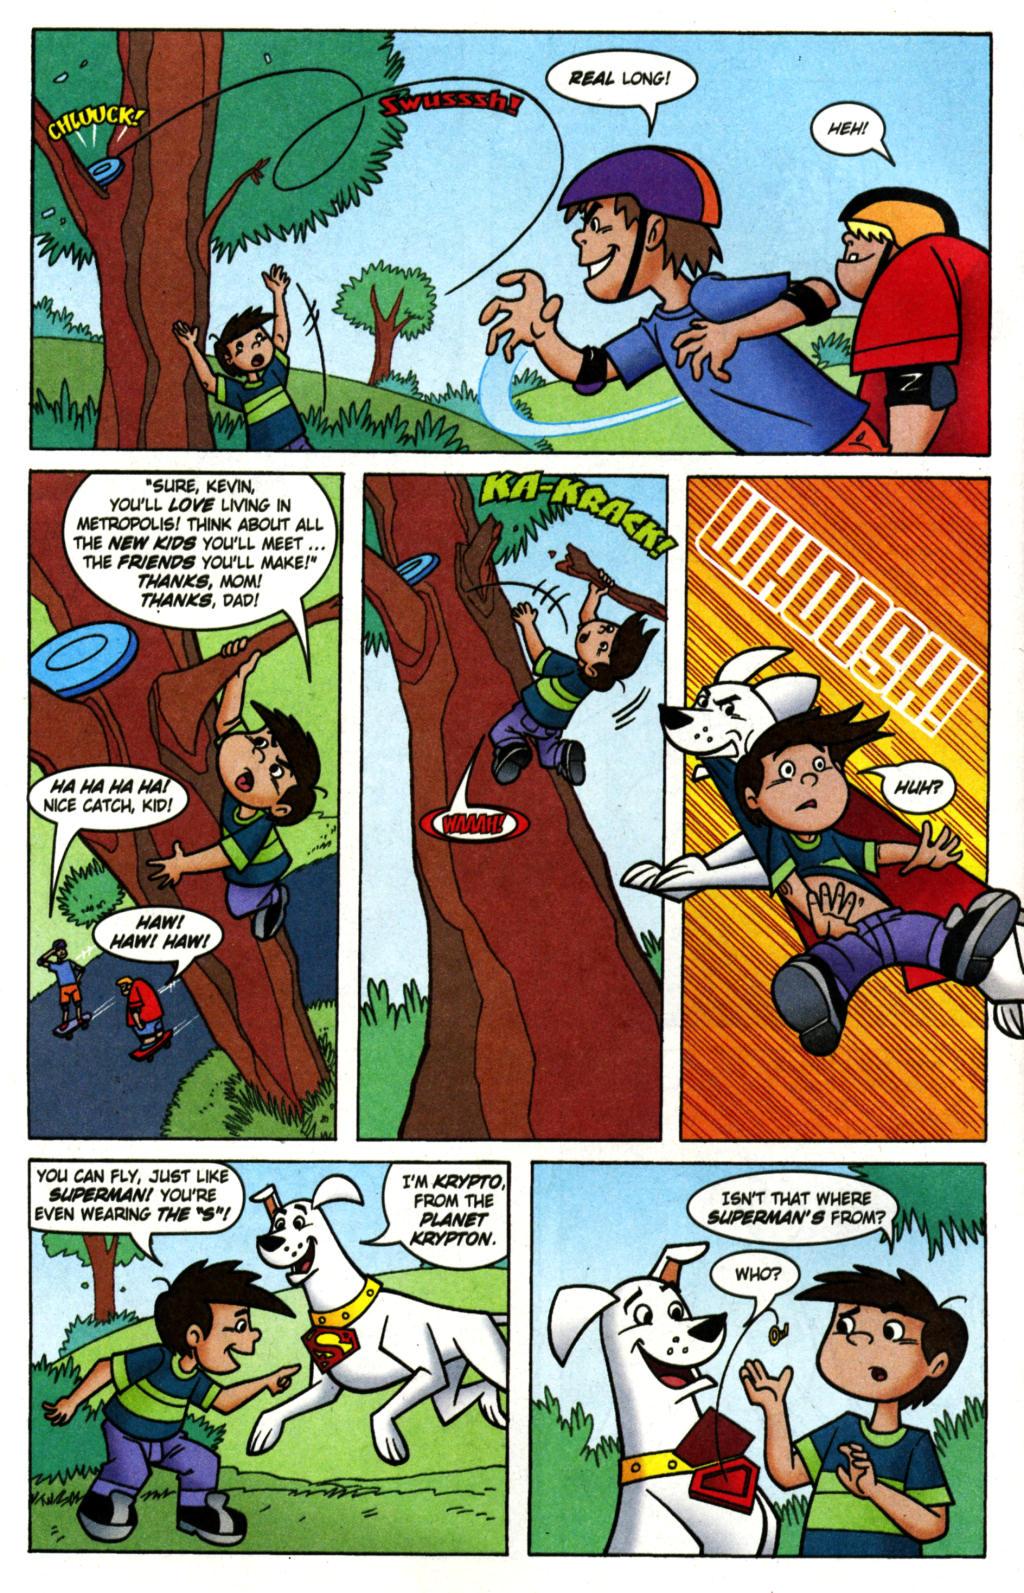 Read online Krypto the Superdog comic -  Issue #1 - 5